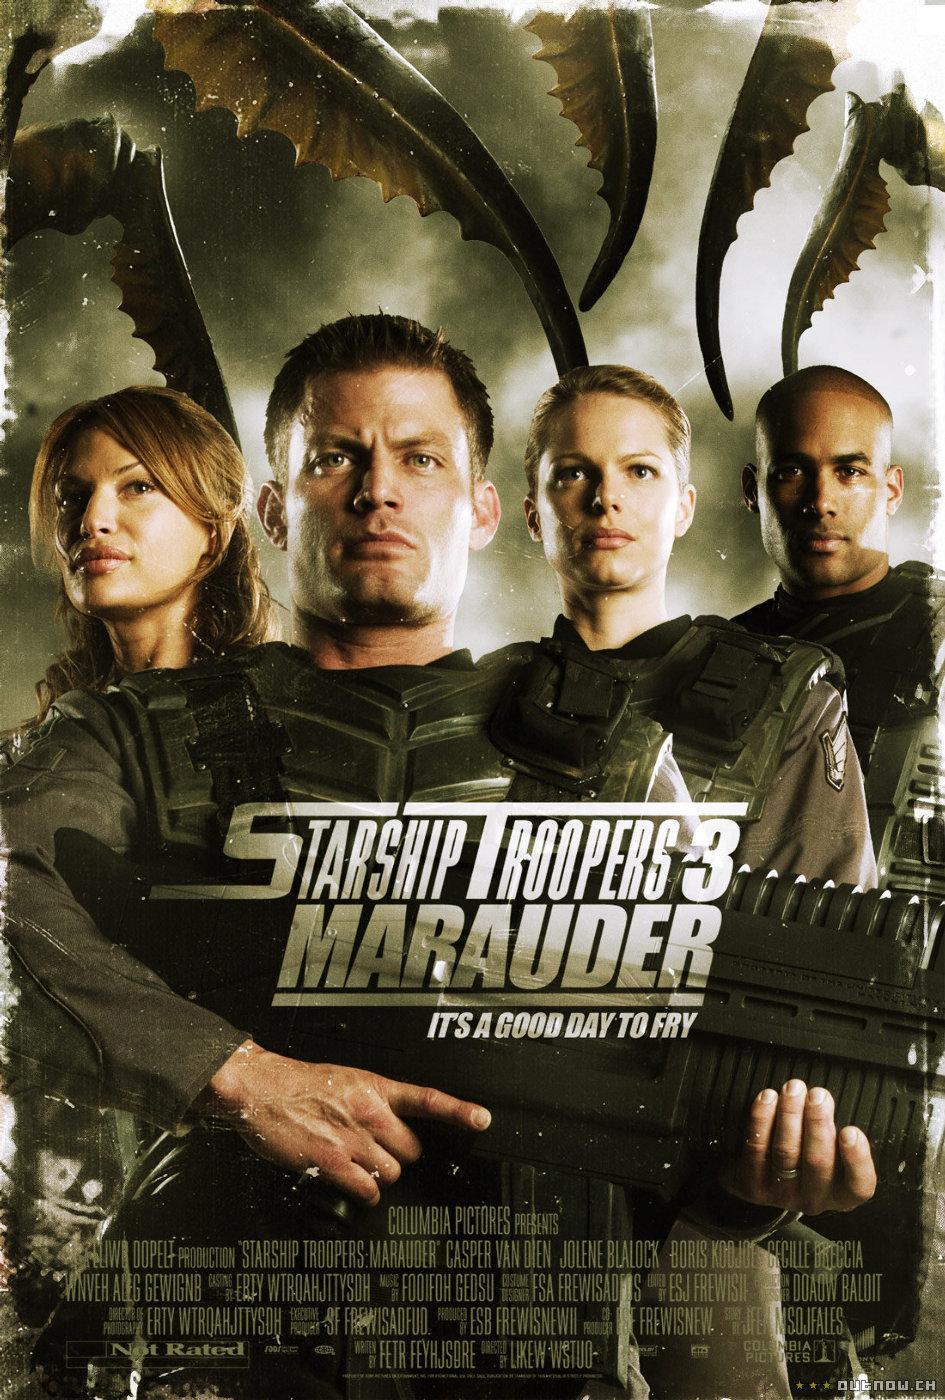 Starship Troopers 3: Marauder: Amazon.de: Casper Dien